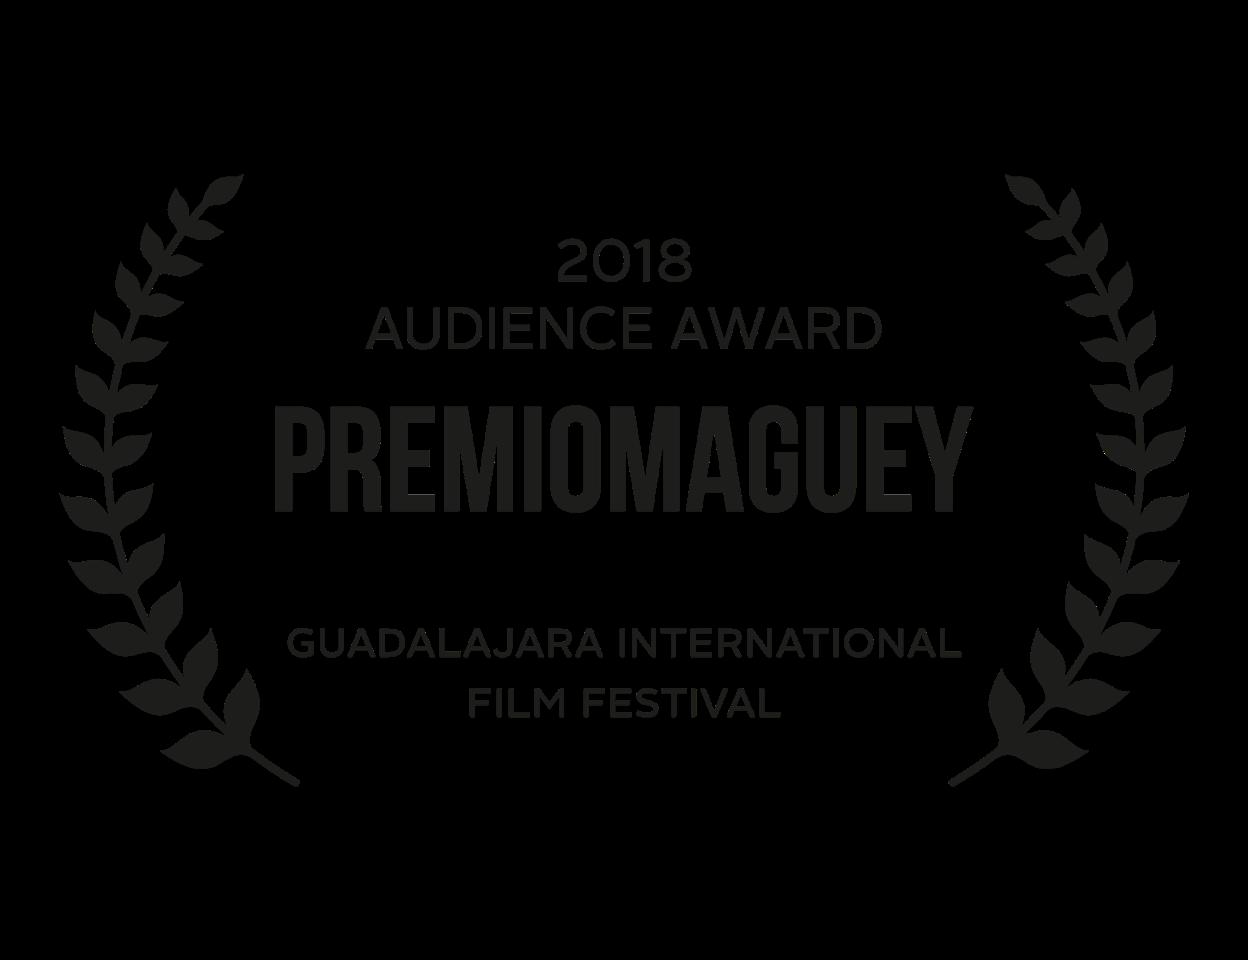 Premio Maguey - Laurel 2018 Audience Award (2).png